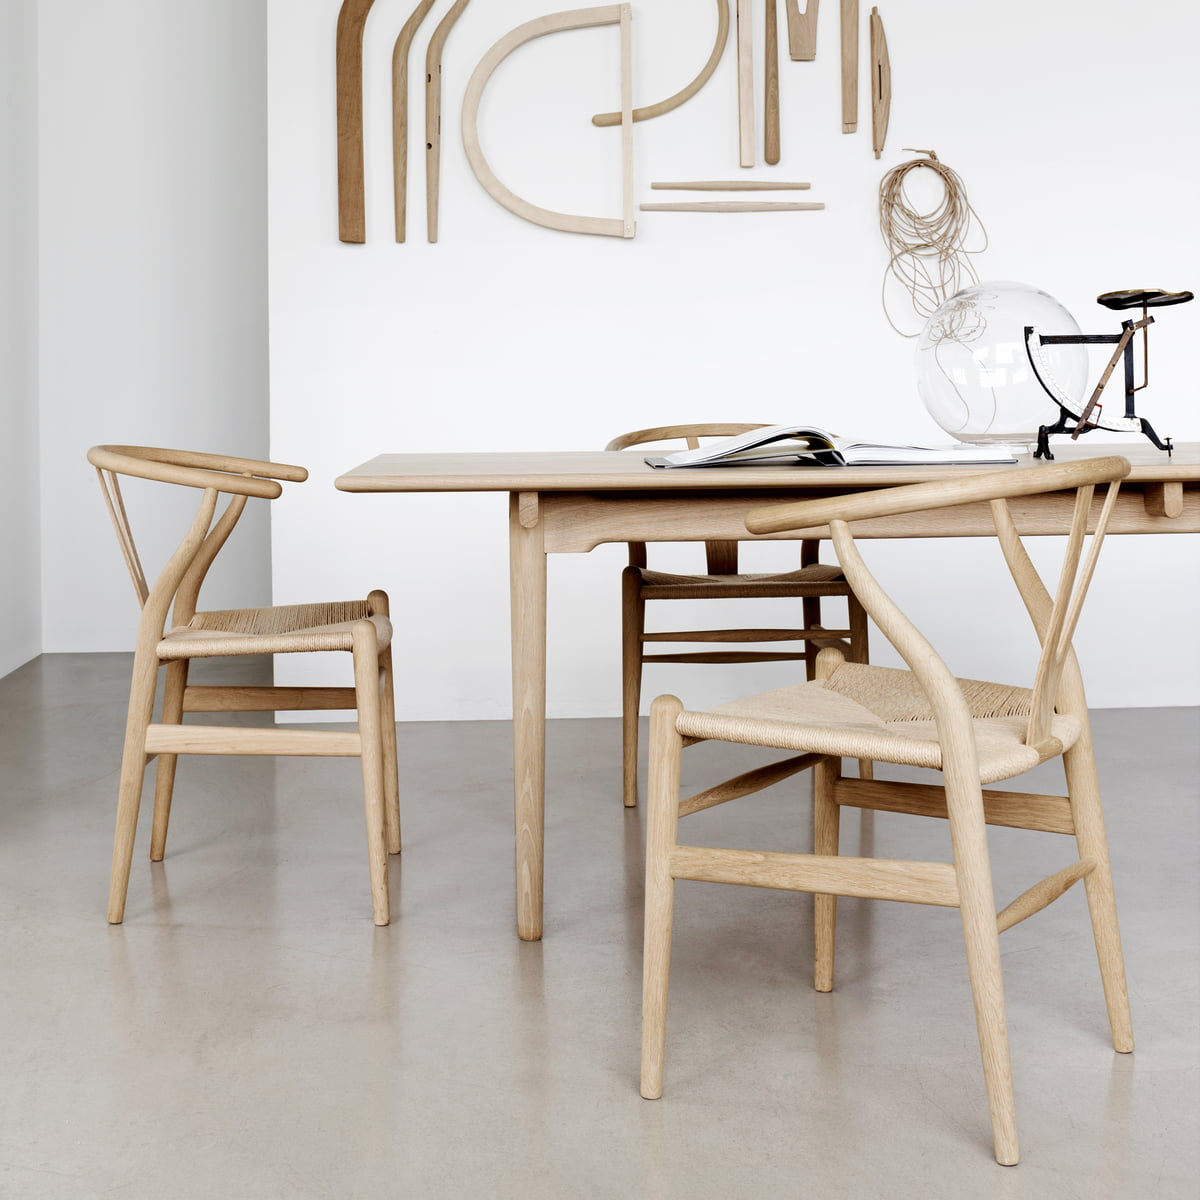 carl hansen ch24 wishbone chair - Wishbone Chair